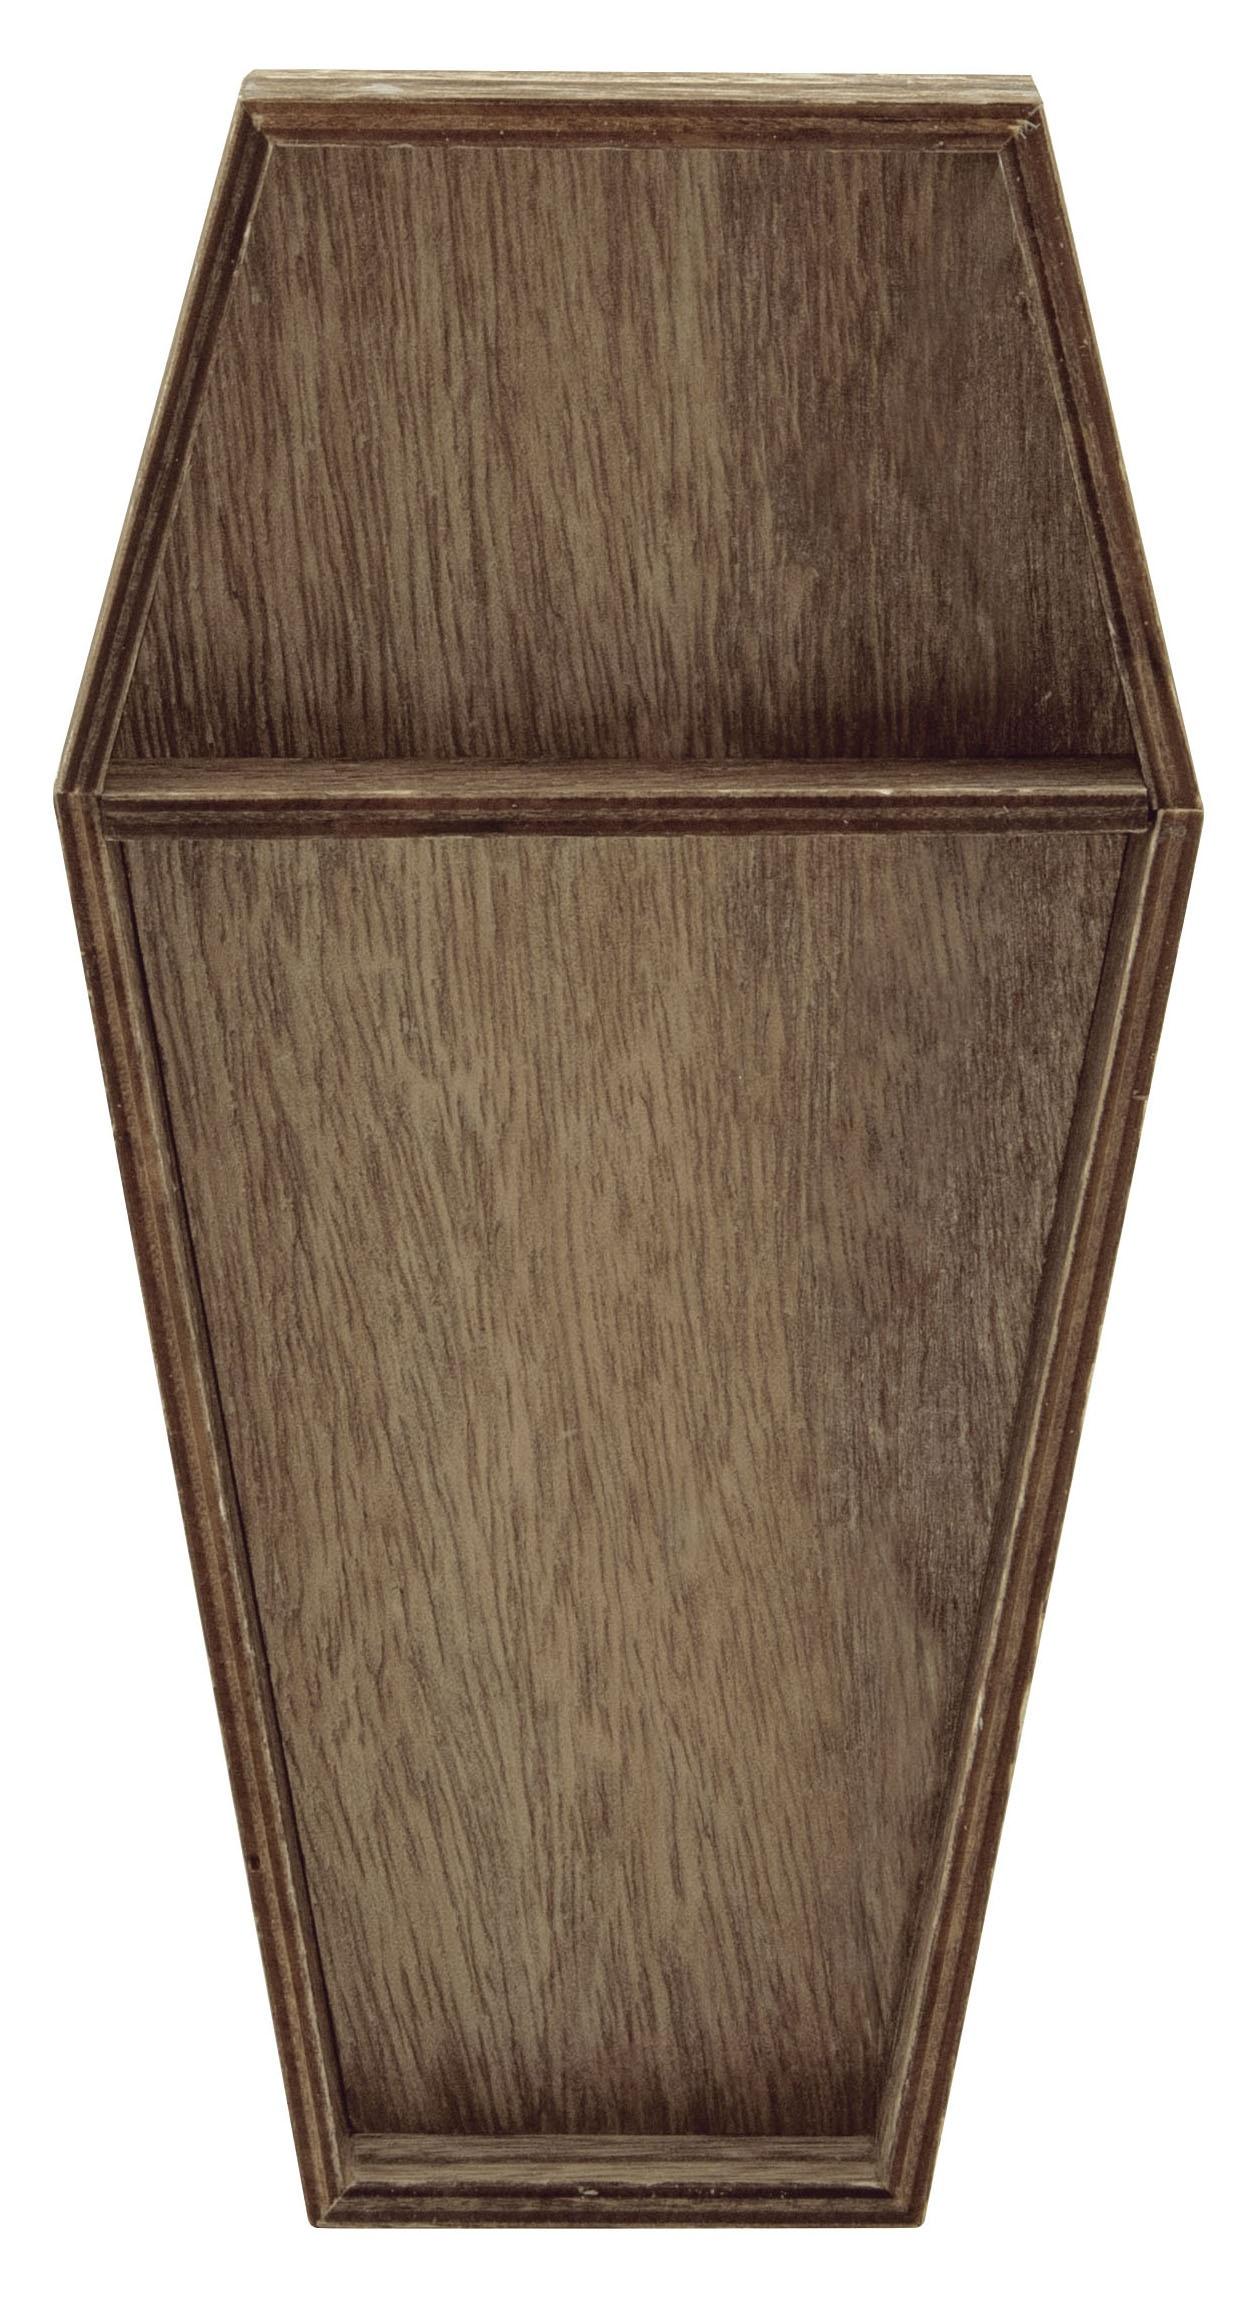 Idea-Ology Wooden Vignette Coffin Tray-